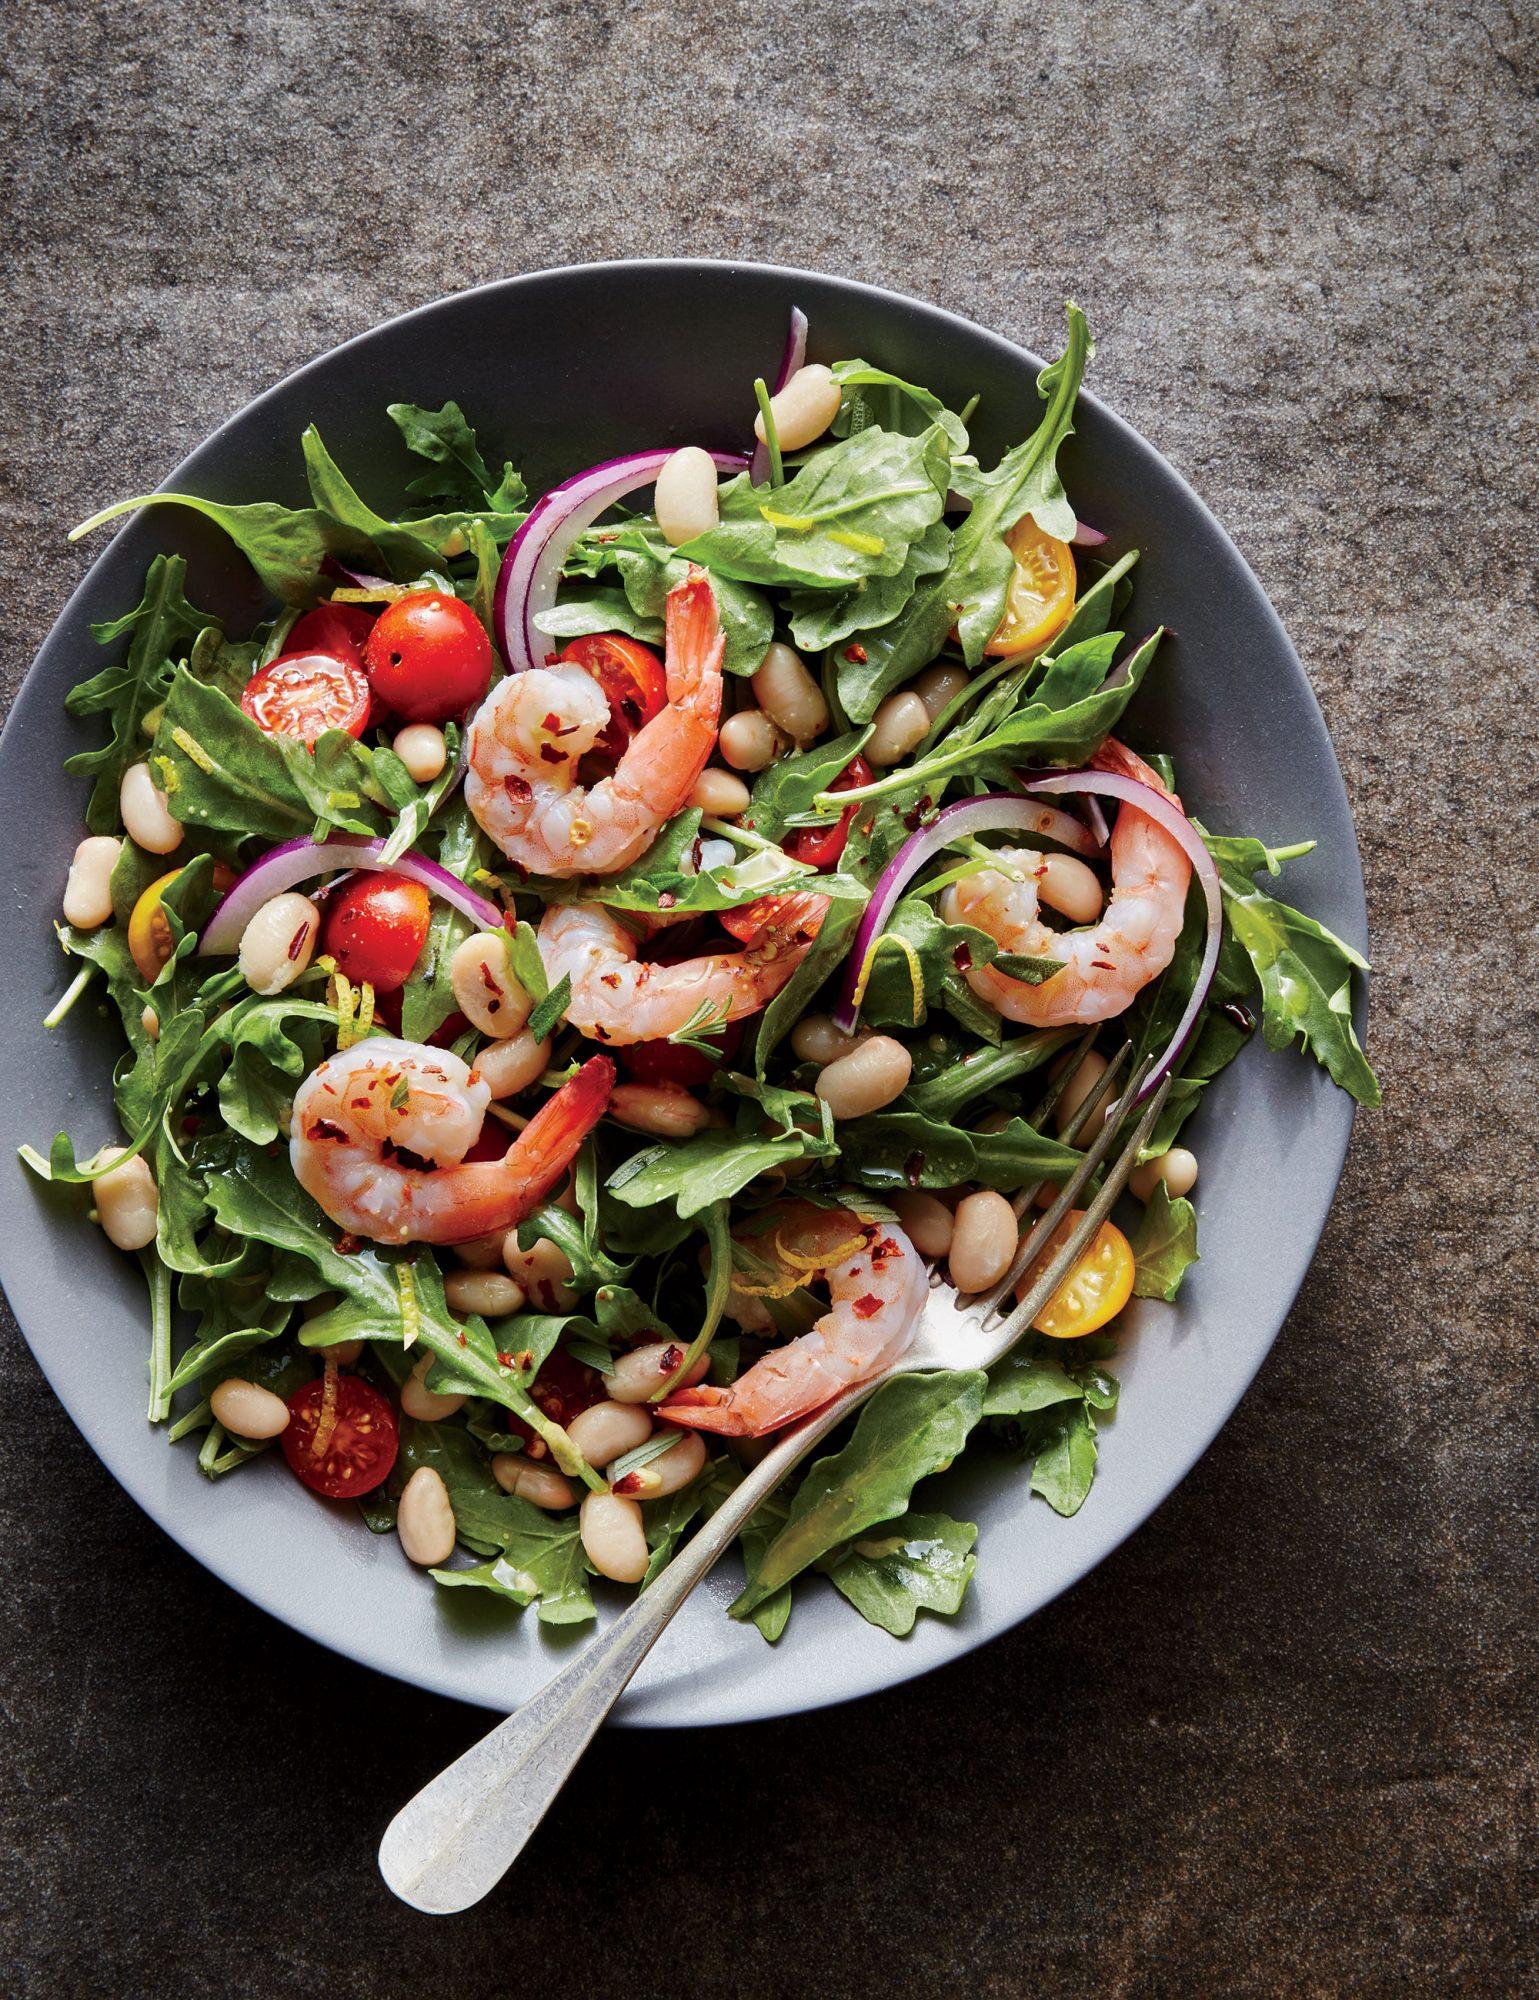 Tuscan White Bean Salad with Shrimp